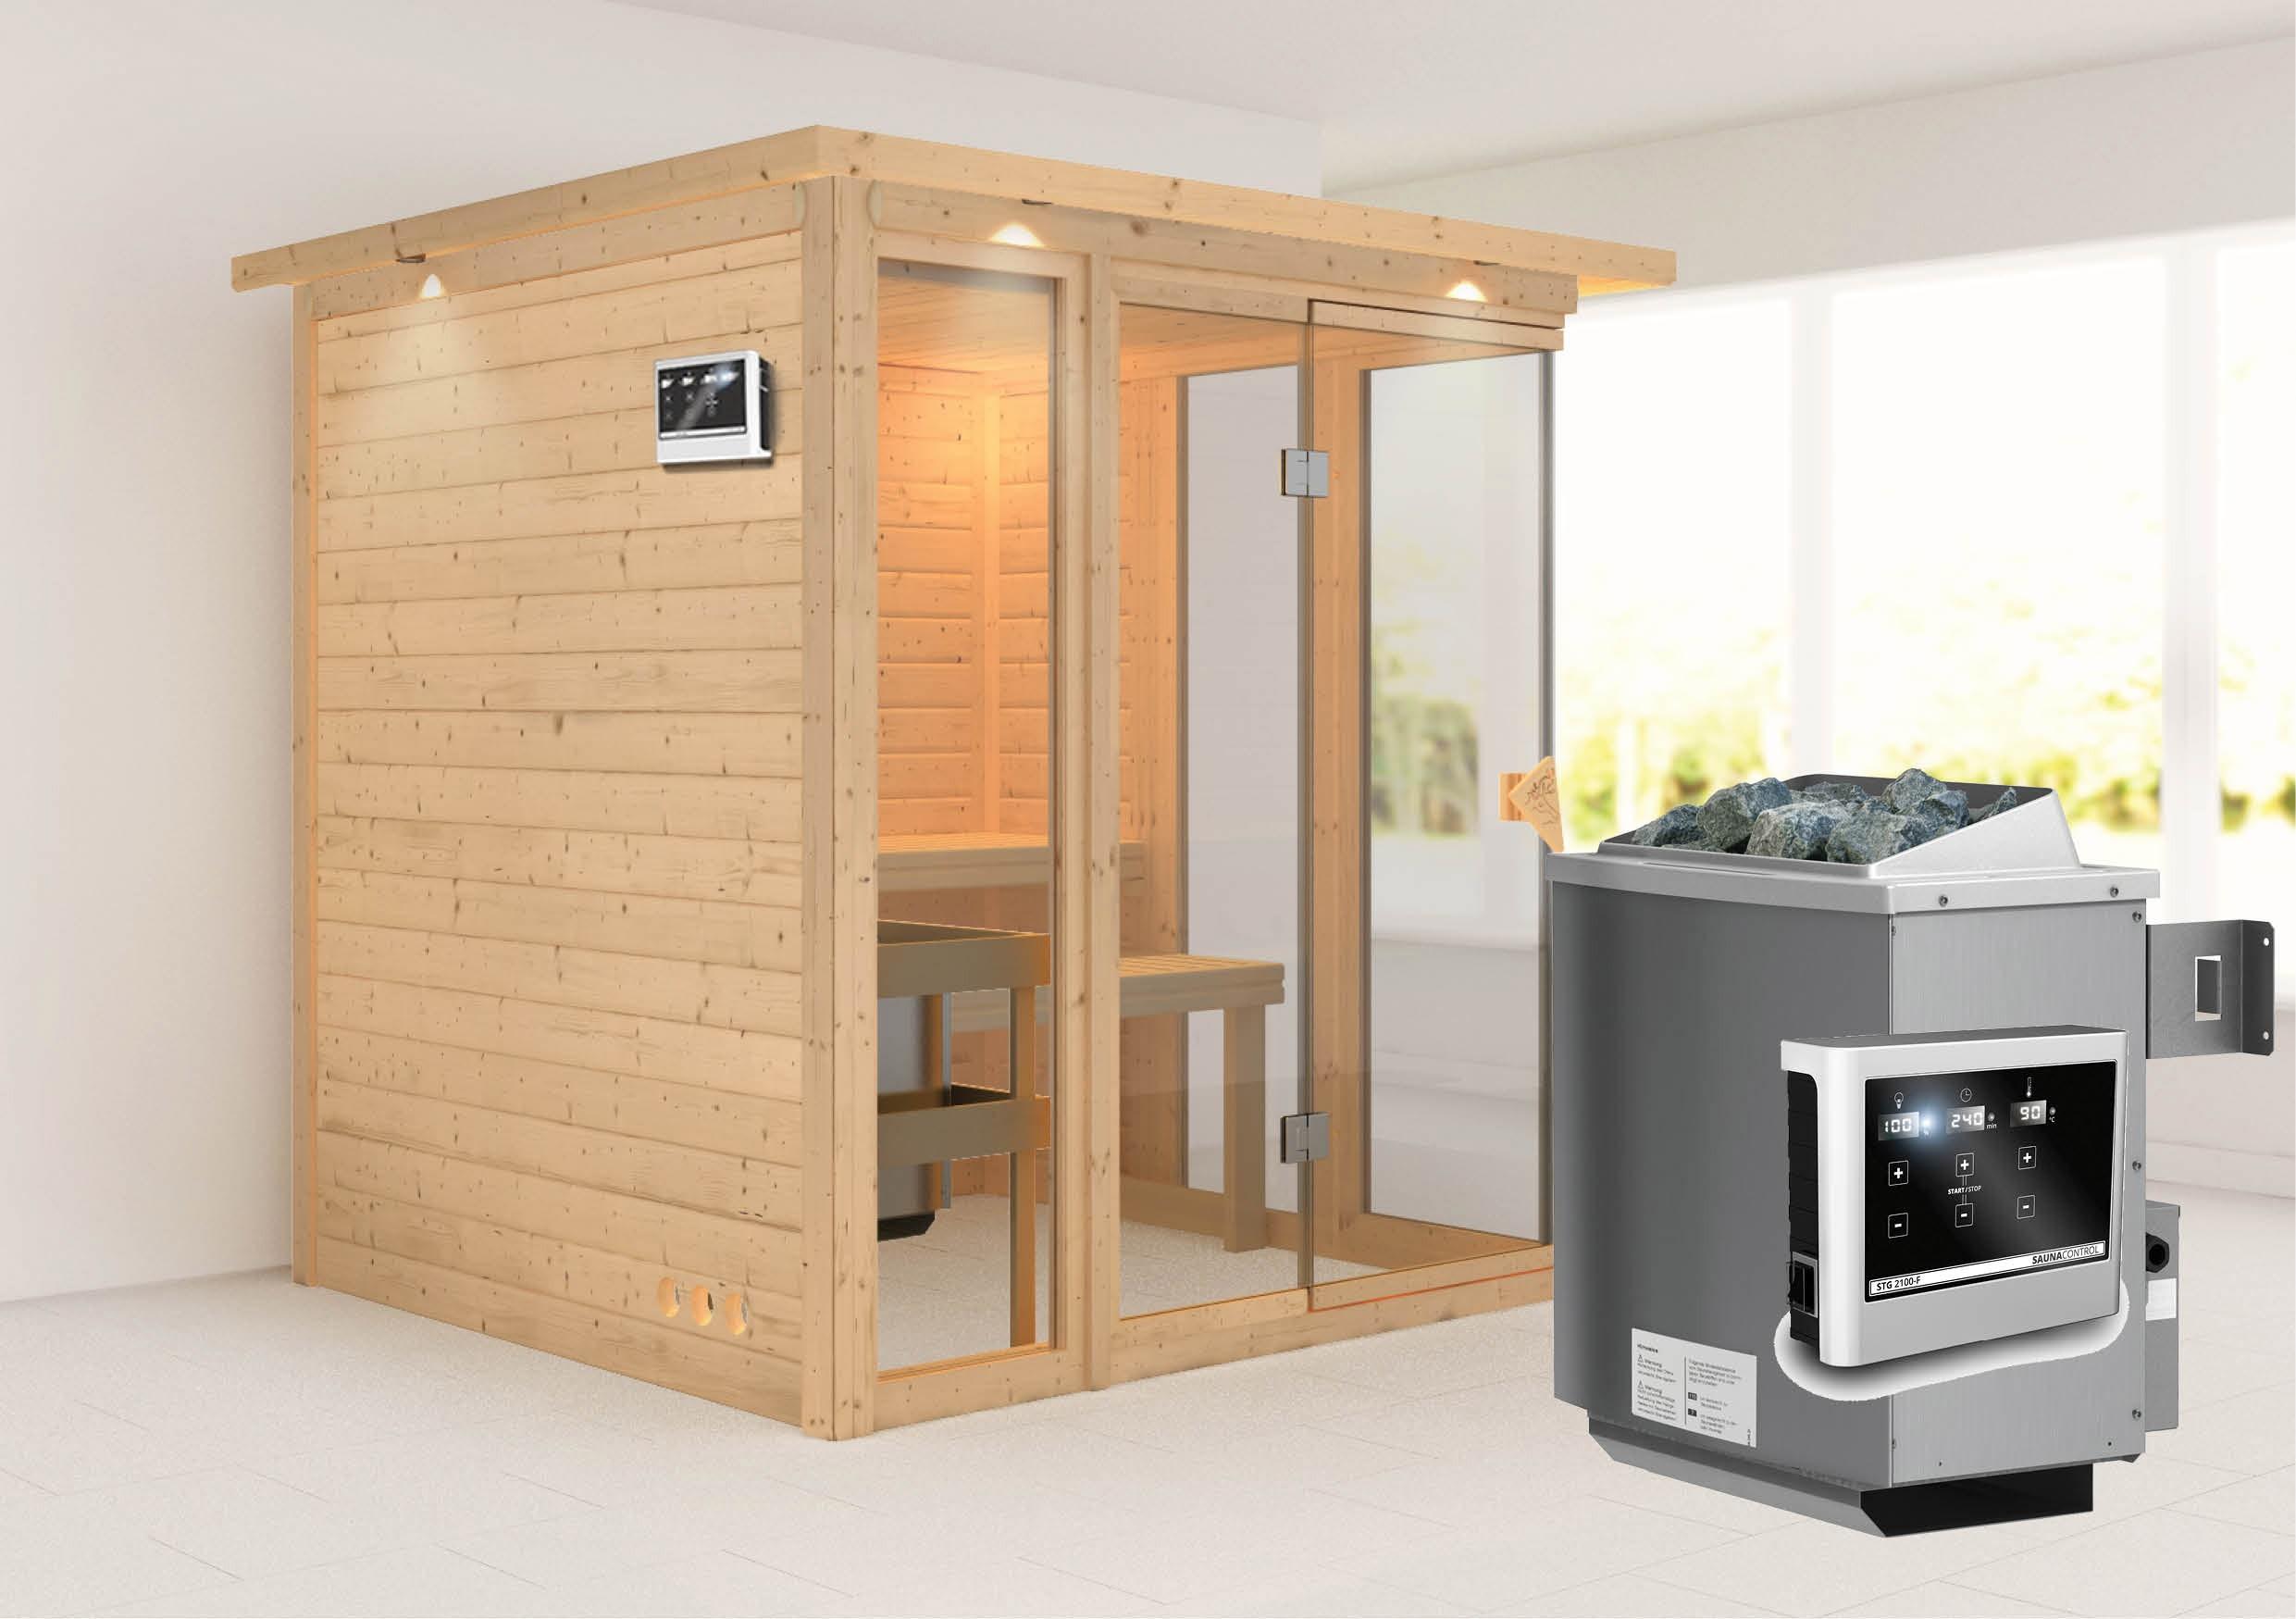 karibu sauna paavo 40mm dachkranz ofen 9kw extern. Black Bedroom Furniture Sets. Home Design Ideas